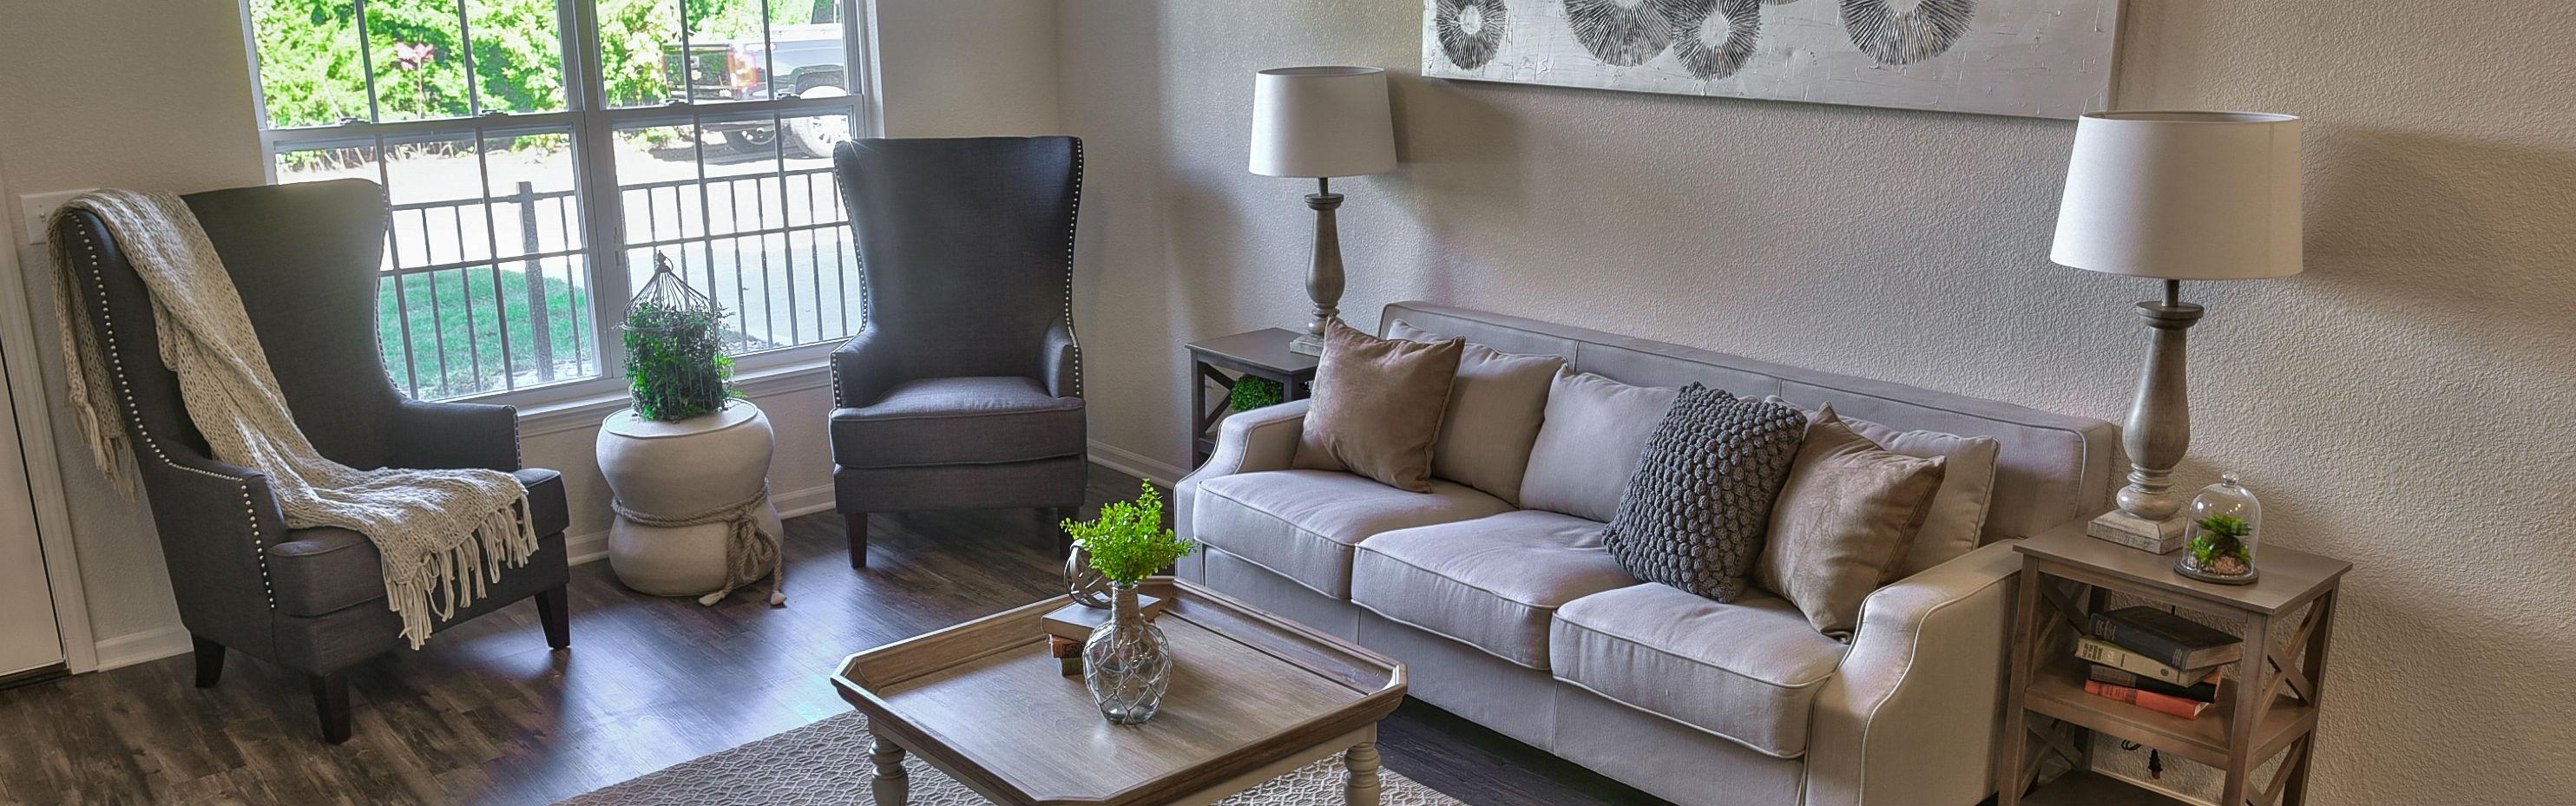 townhomes for interior furniture in olathe kansas wizardofozonline rh wizardofozonline com